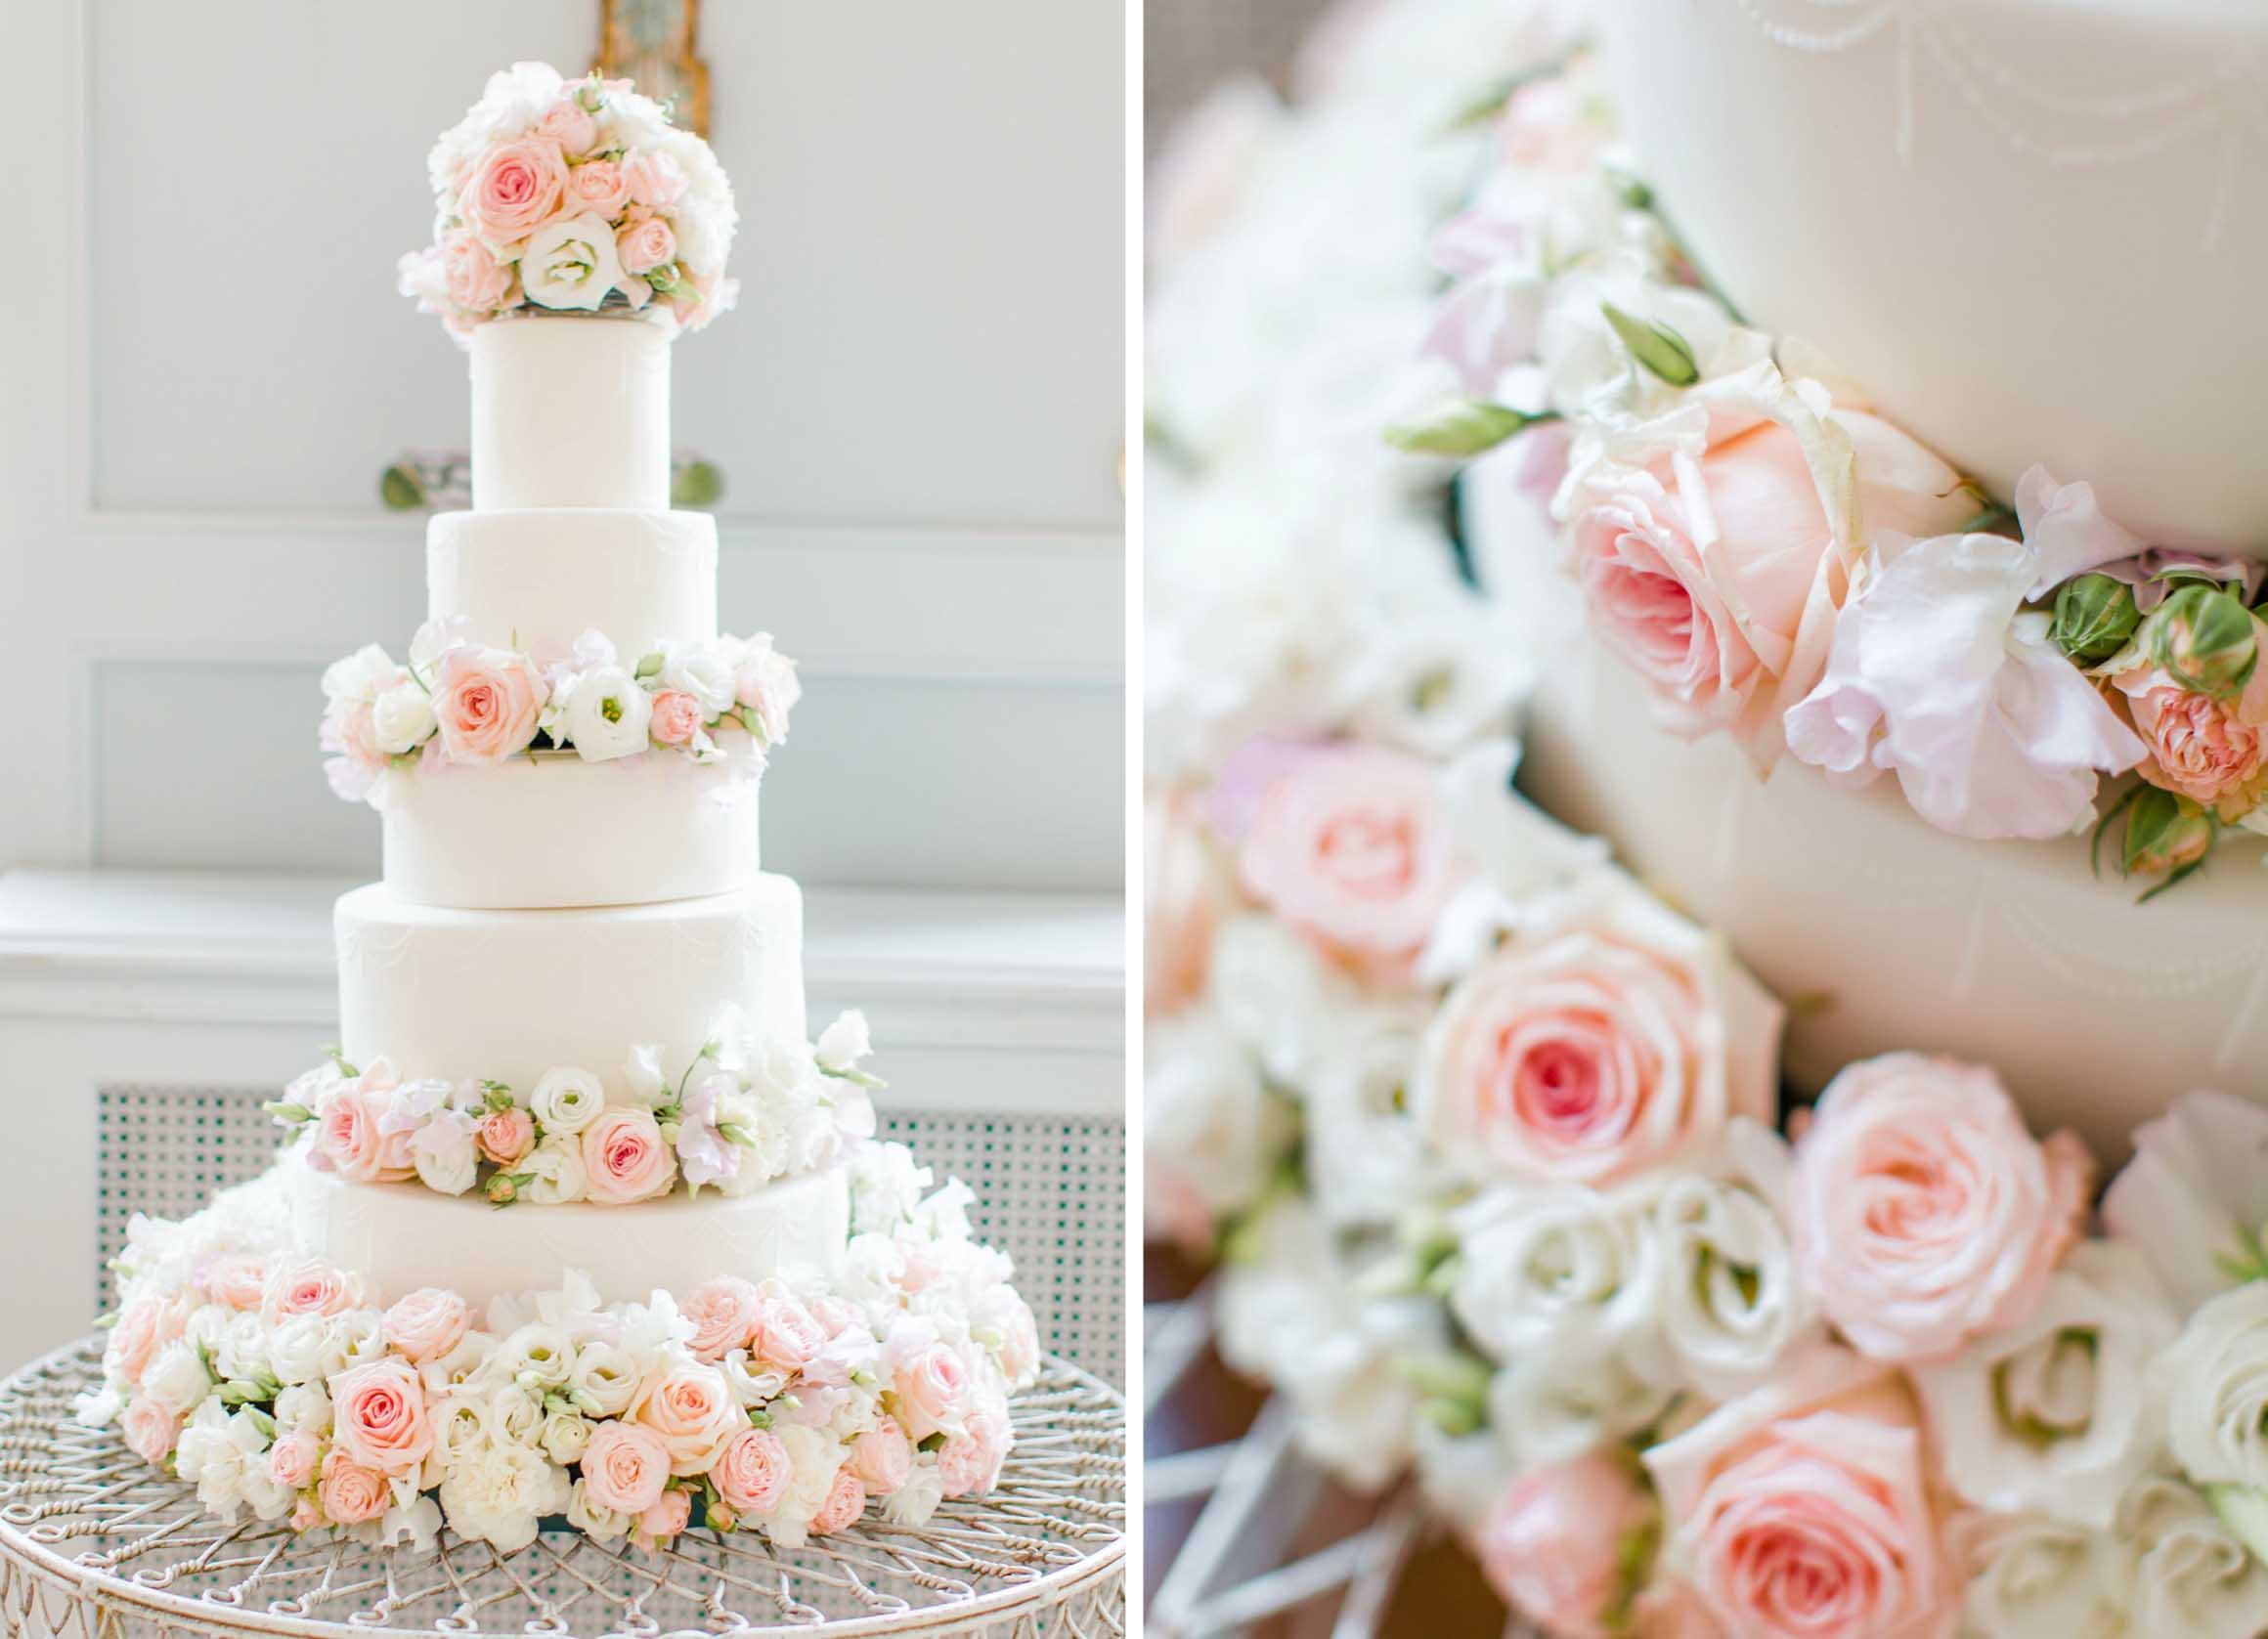 Amy O'Boyle Photography- Destination & UK Fine Art Film Wedding Photographer- Chateau La Durantie Wedding 3.jpg